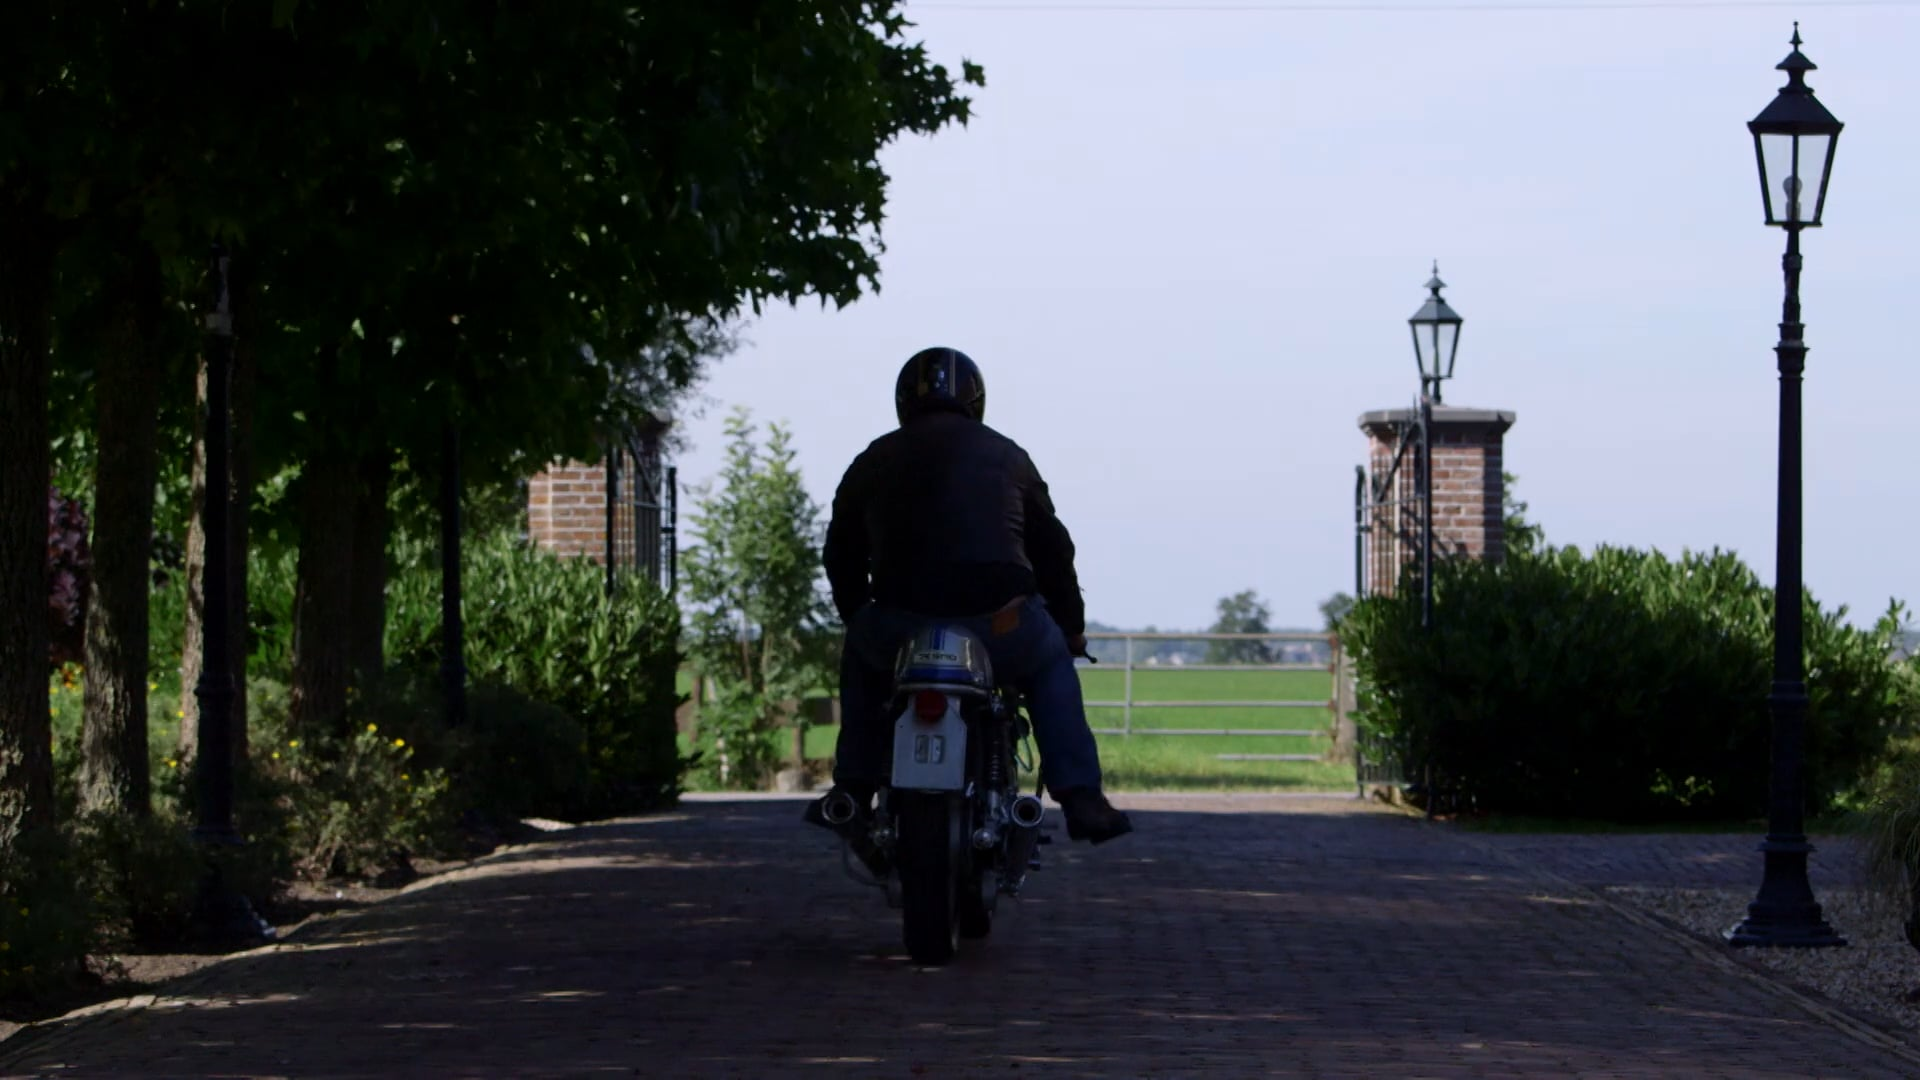 Back To Classics - Ducati Customs